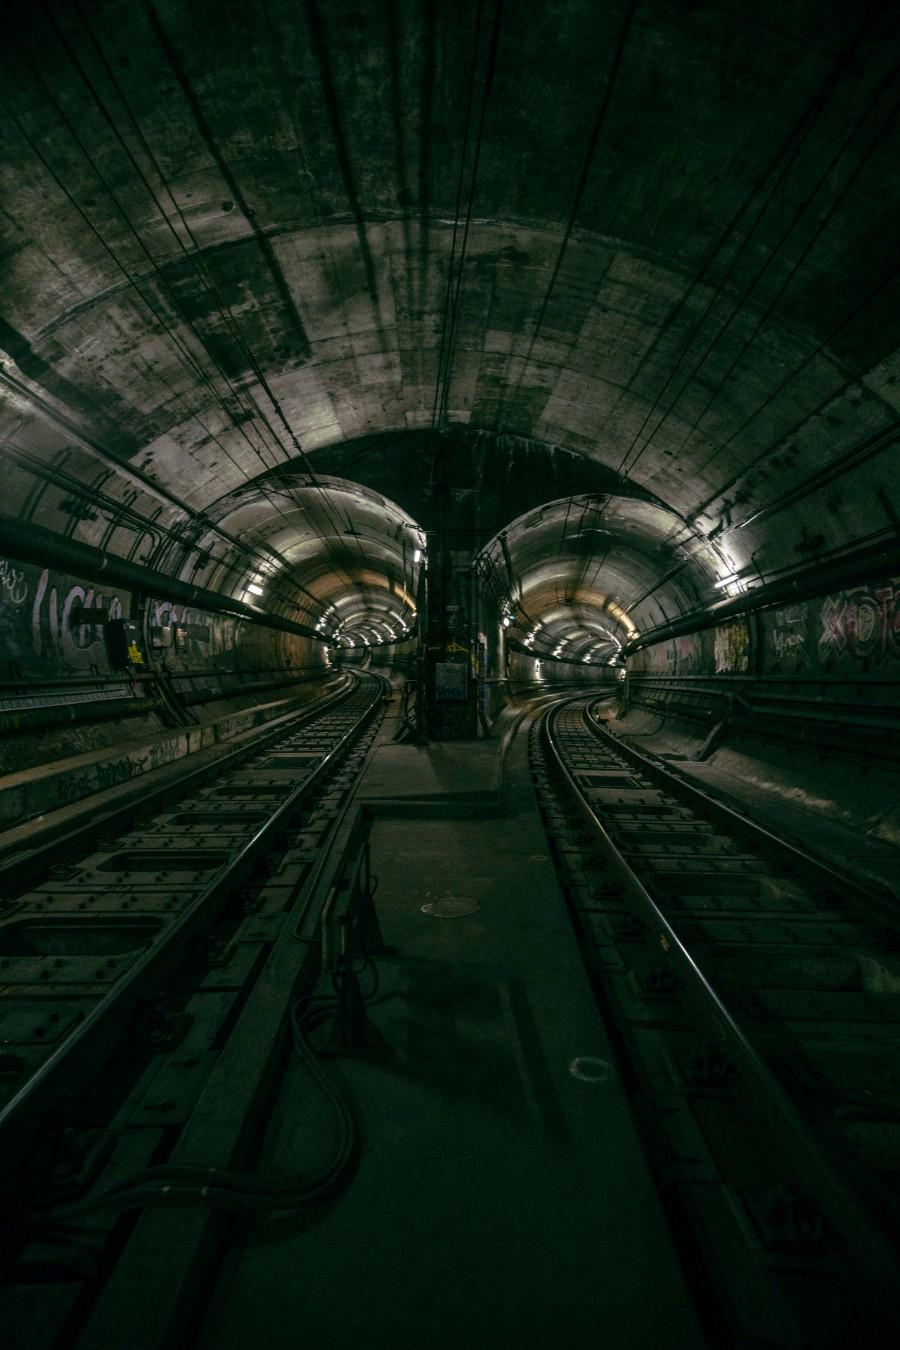 В тоннелях метро